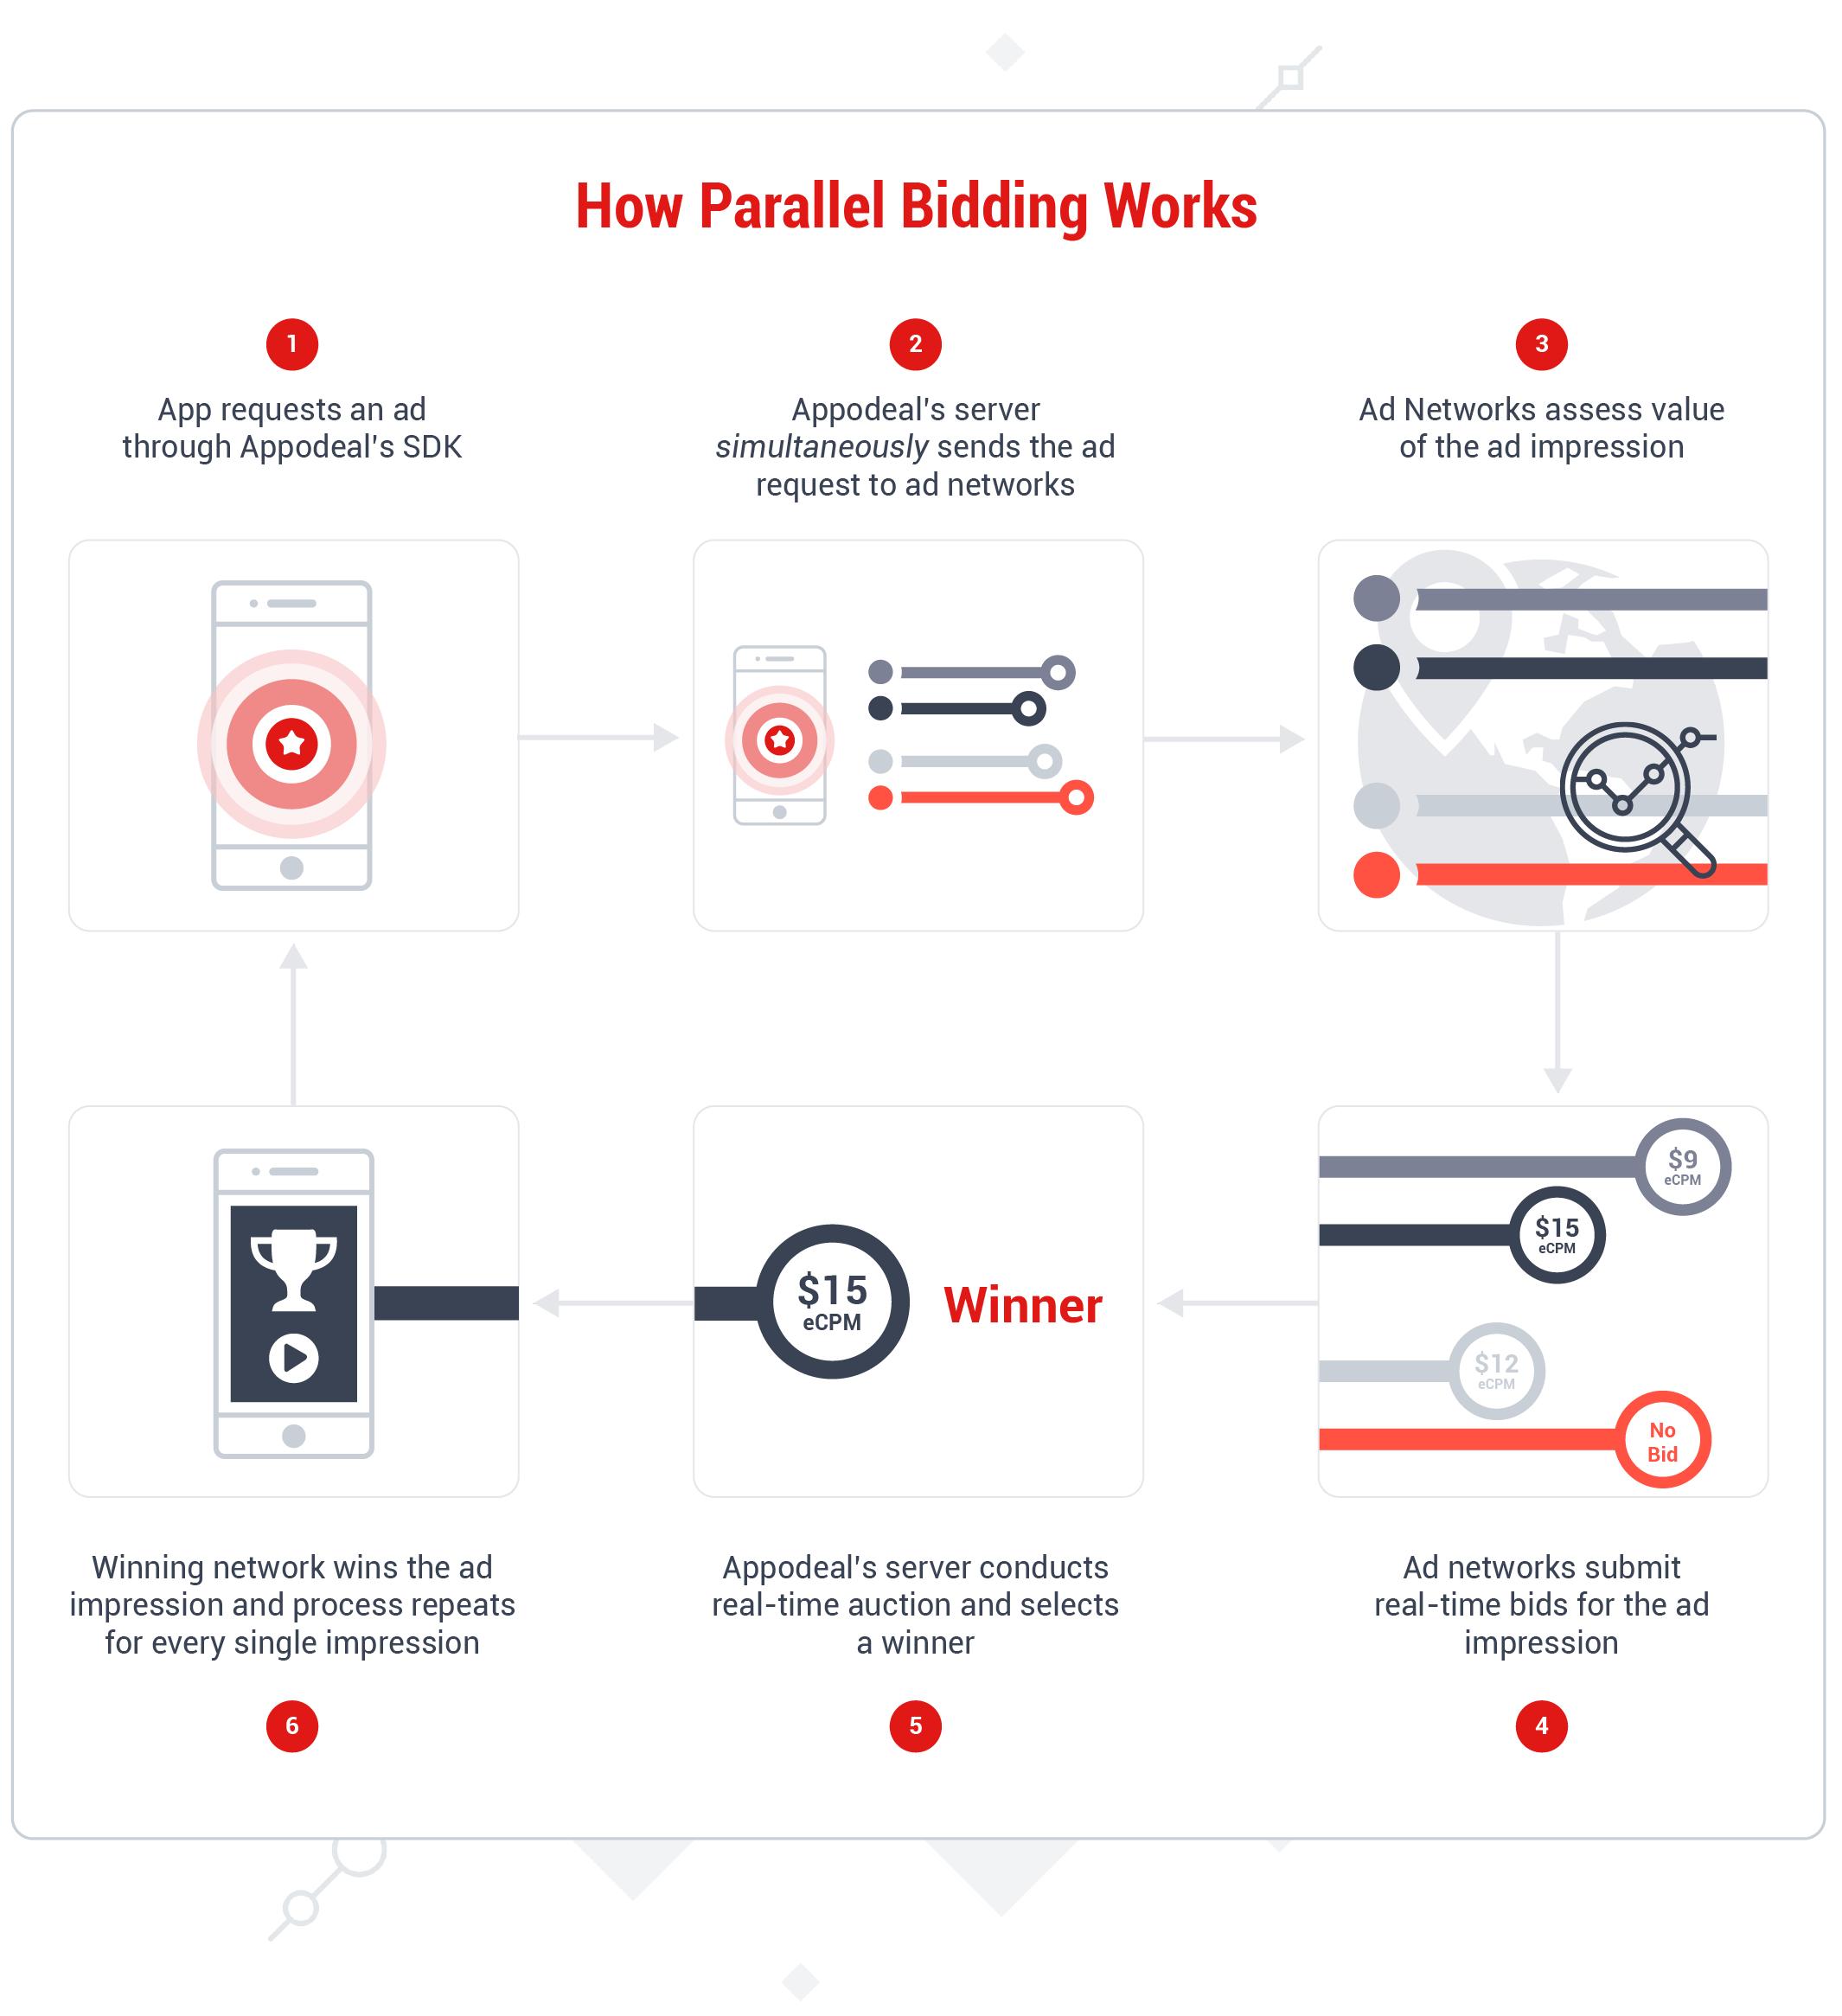 How-PB-Works